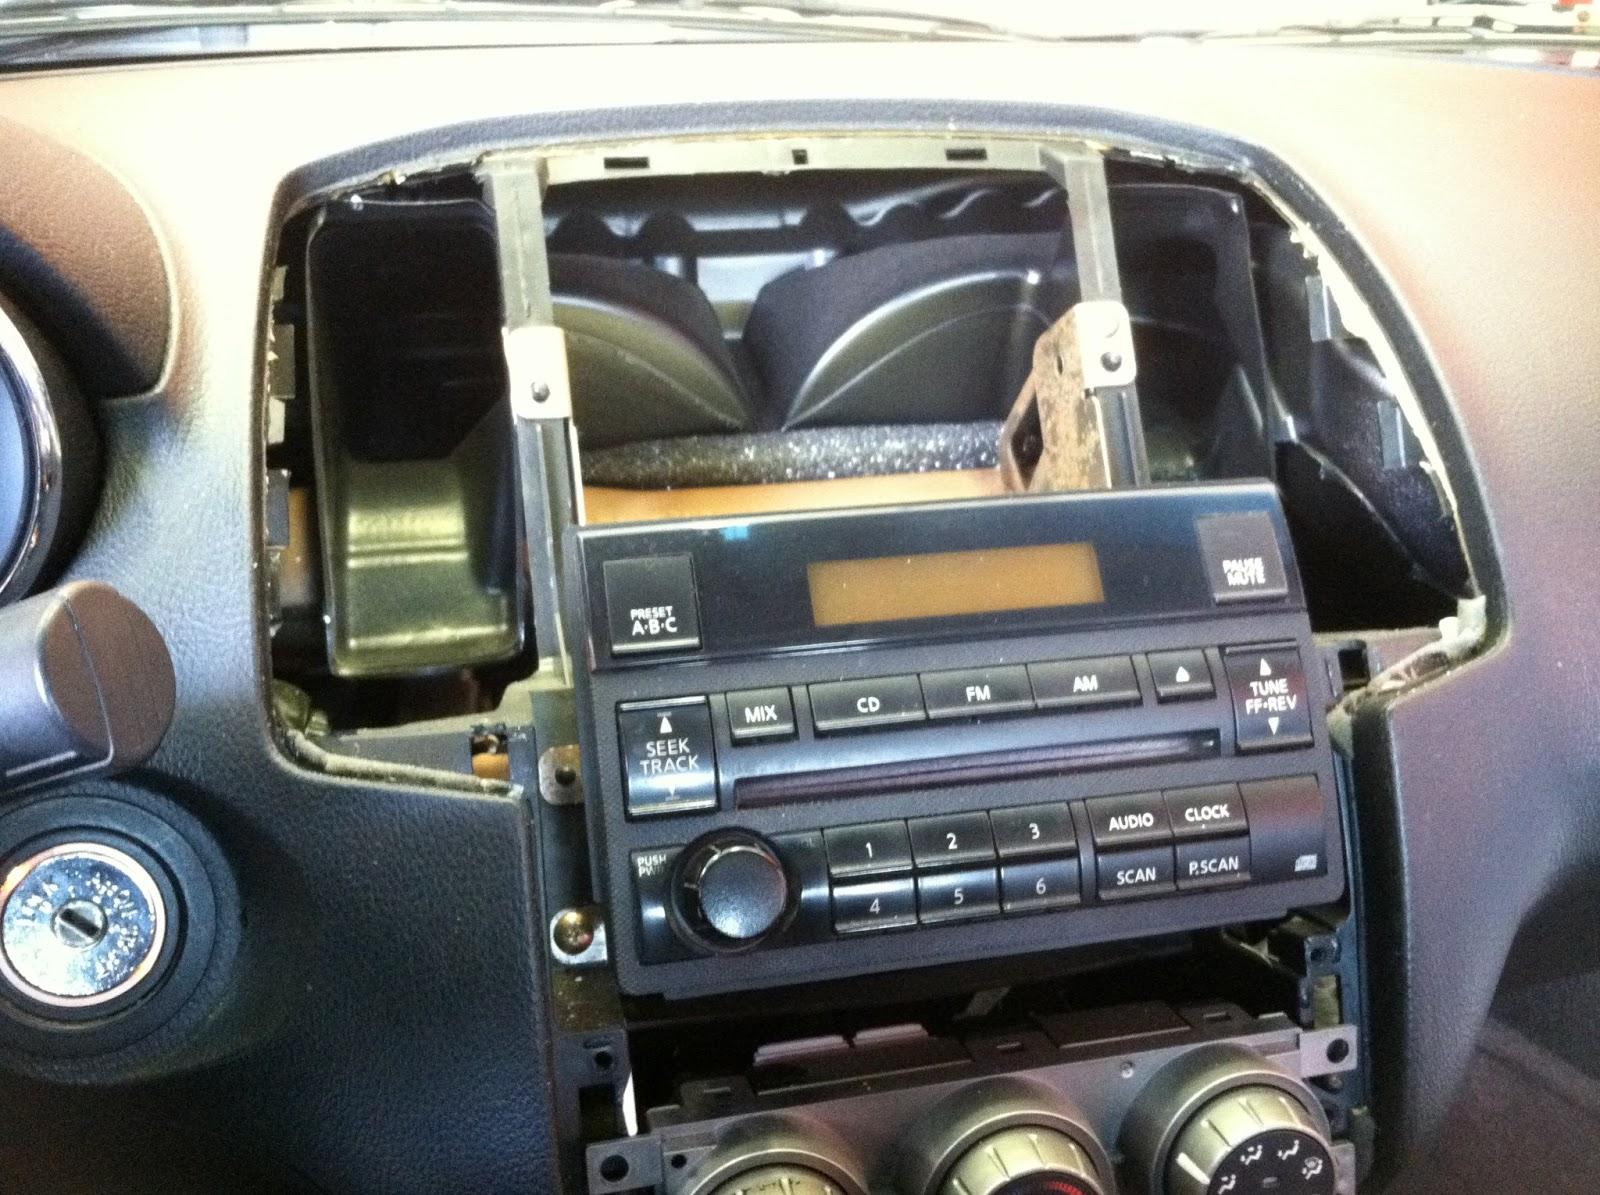 Nissan Maxima: Radio